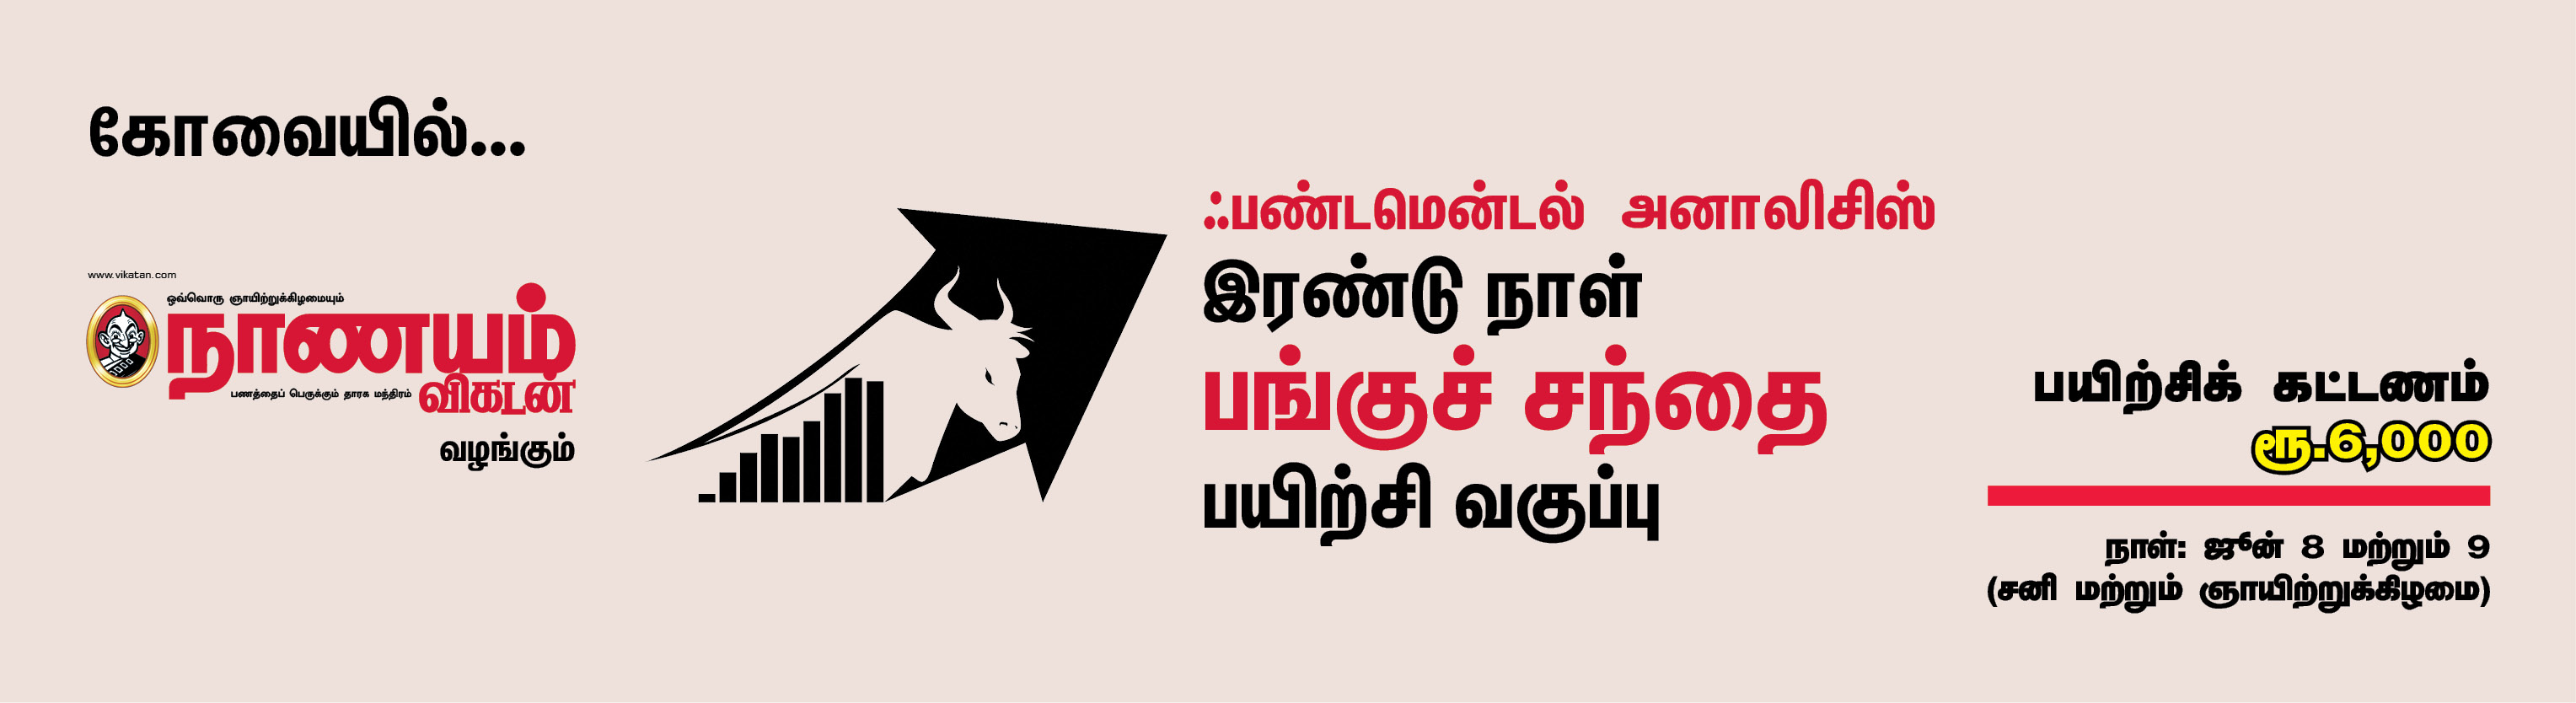 nanayam Event Banner